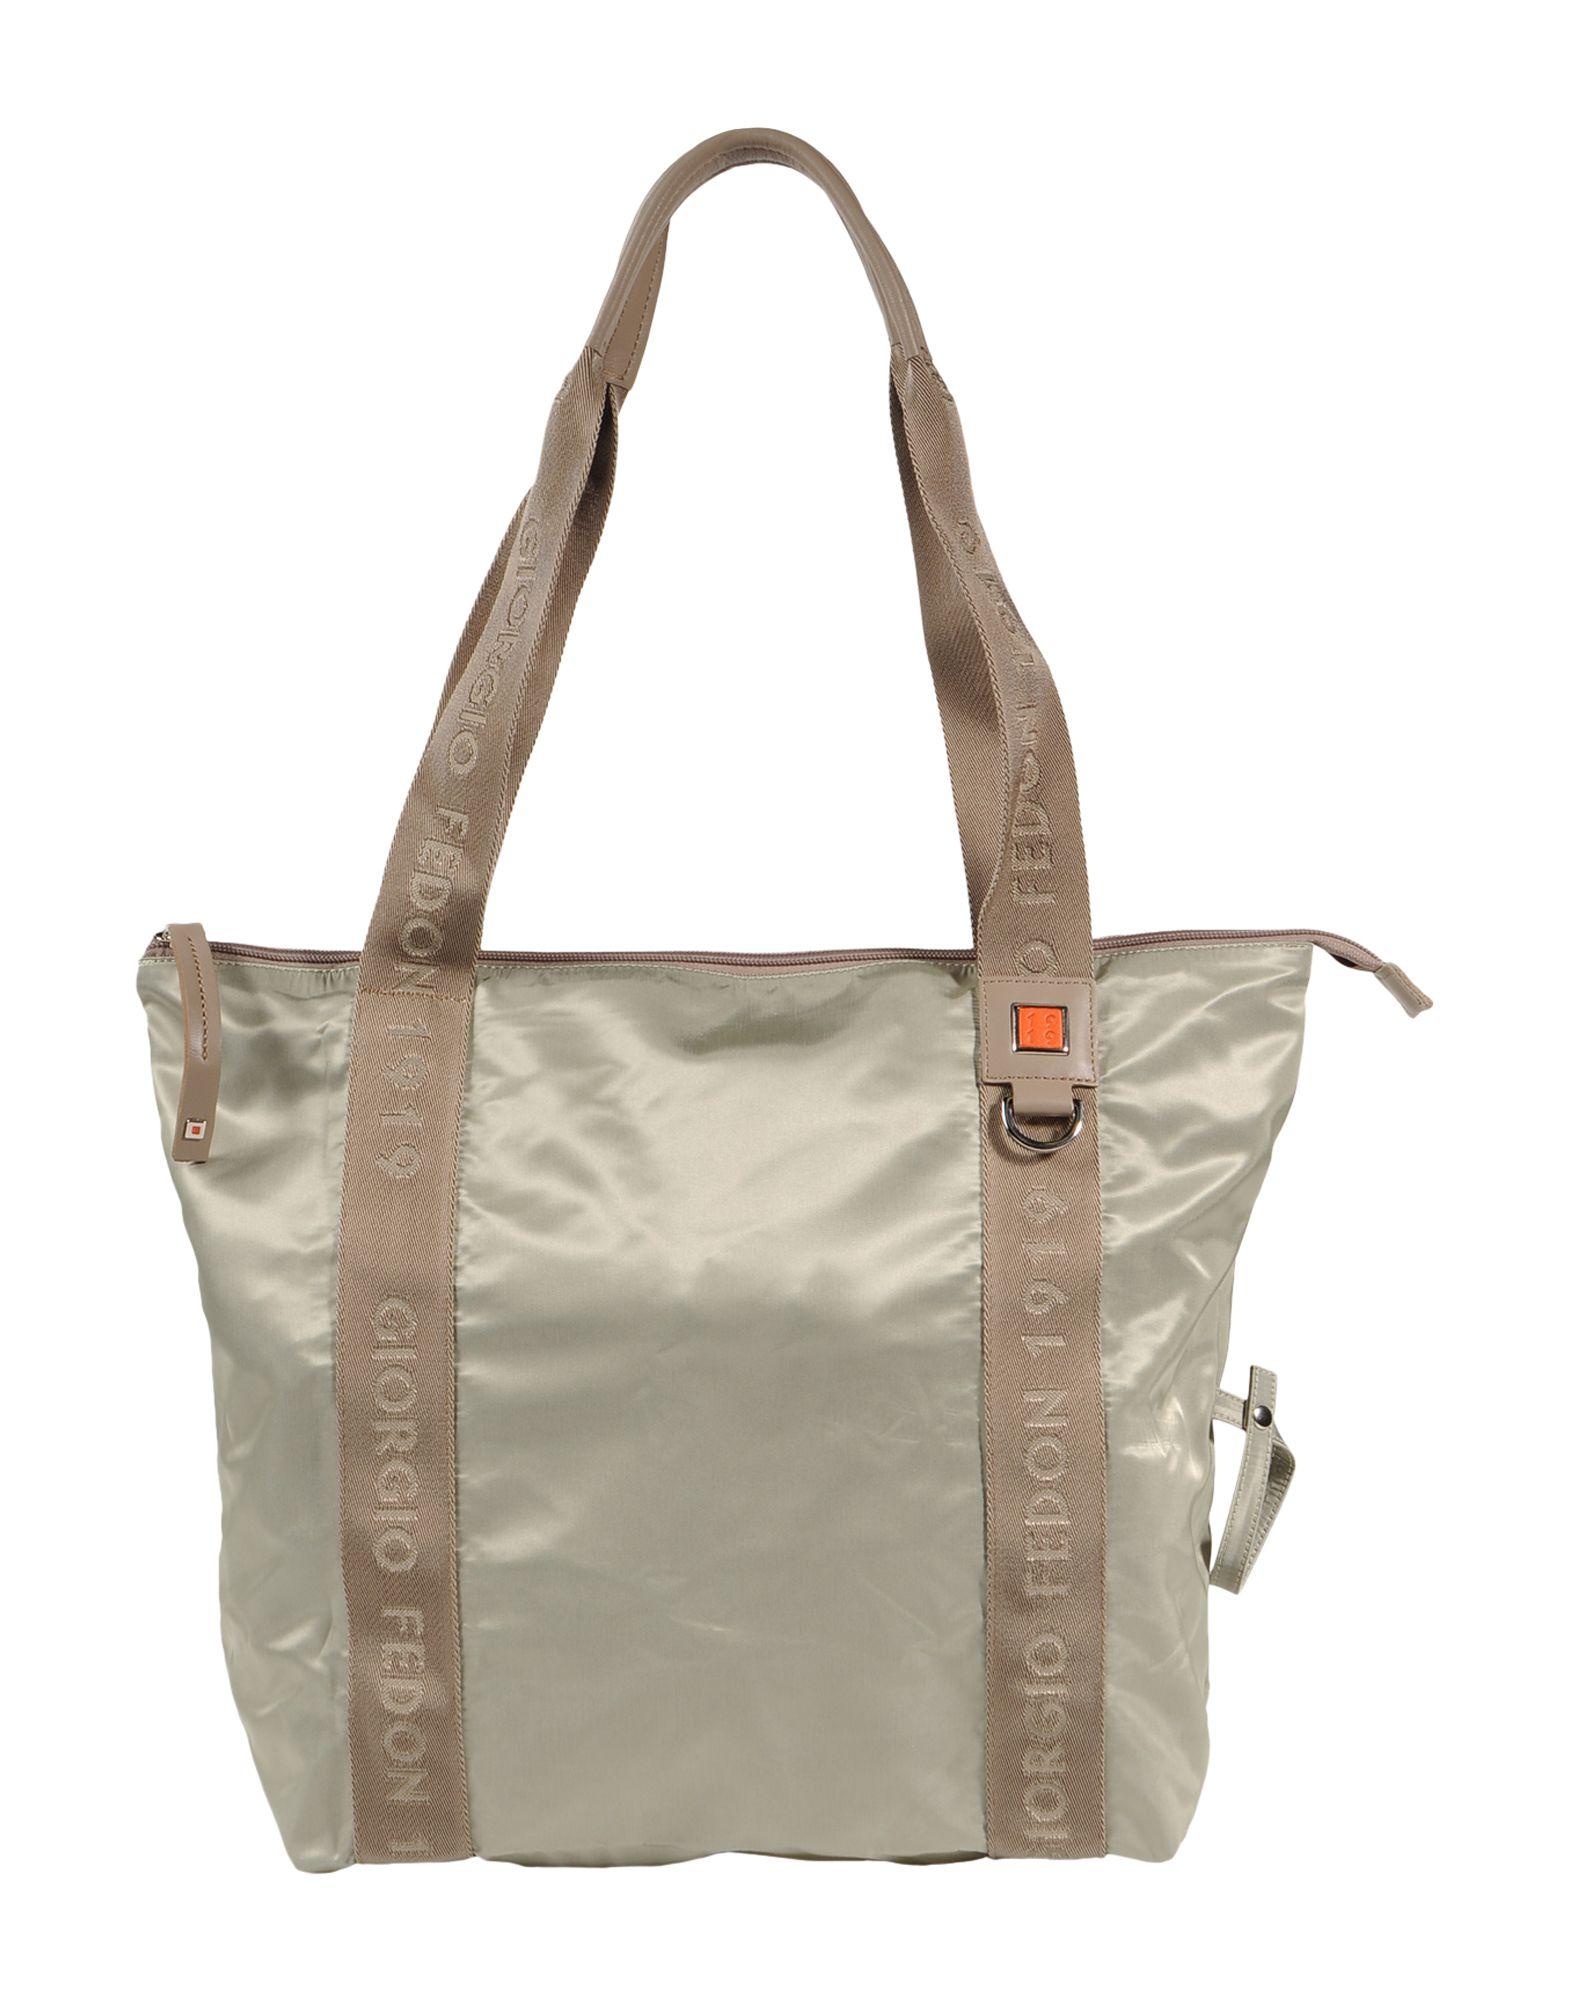 Giorgio fedon Large Fabric Bag in Gray